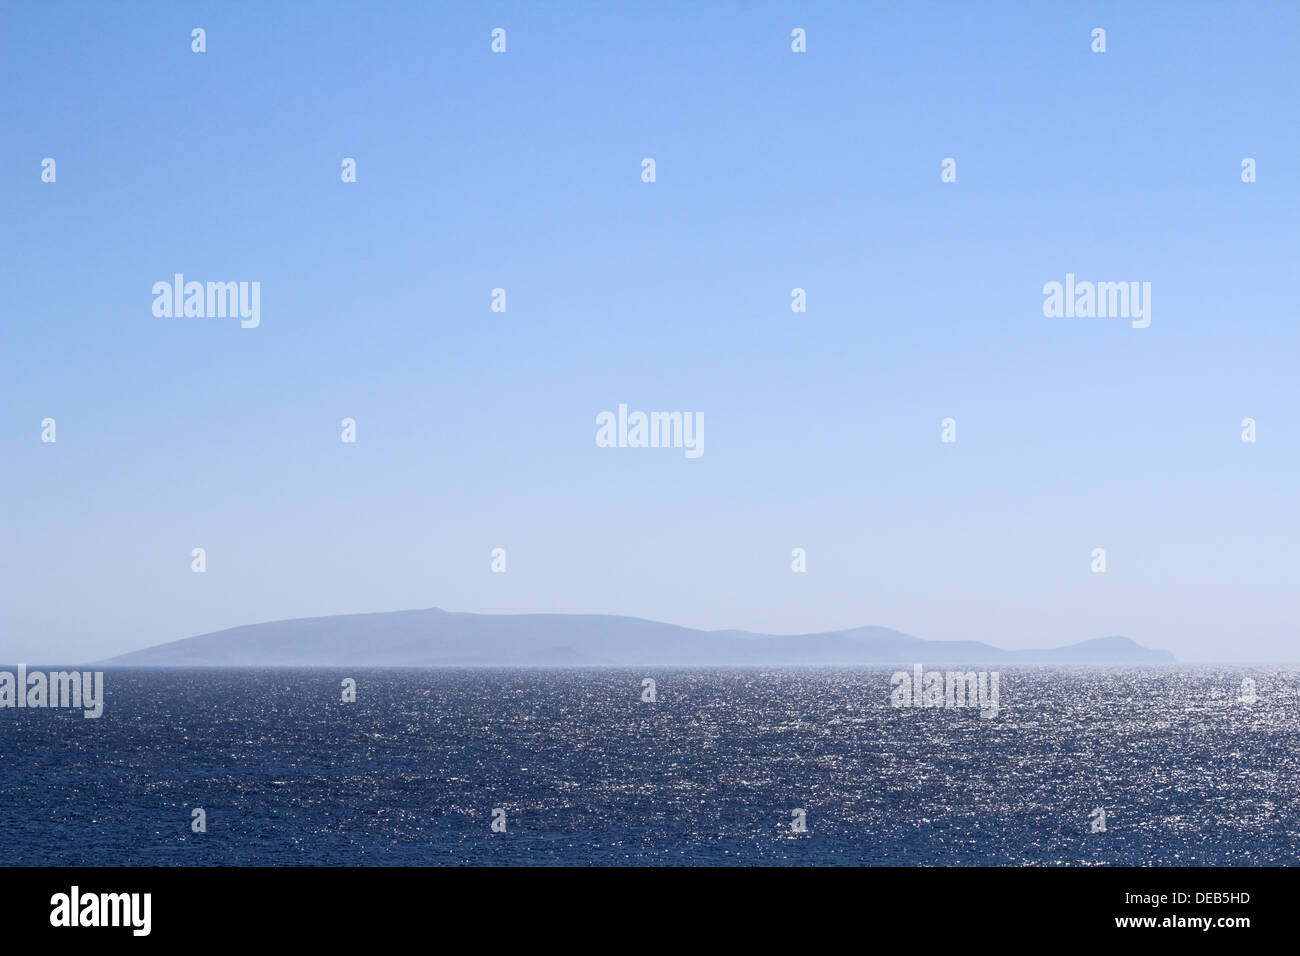 single island